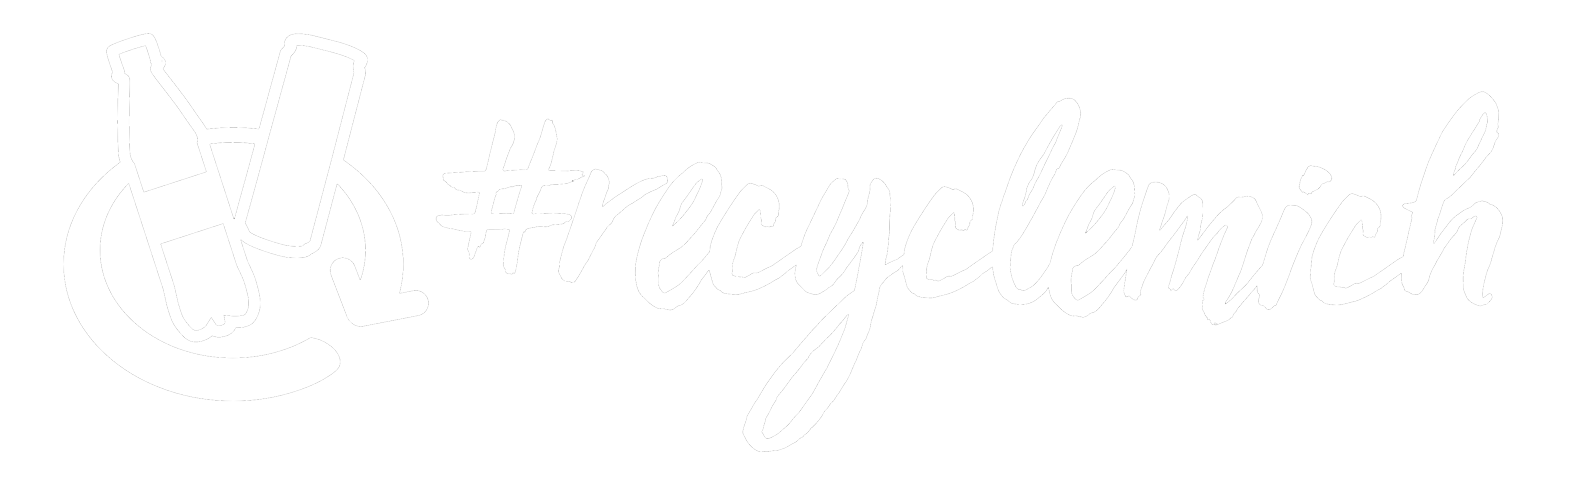 RecycleMich Logo Negative